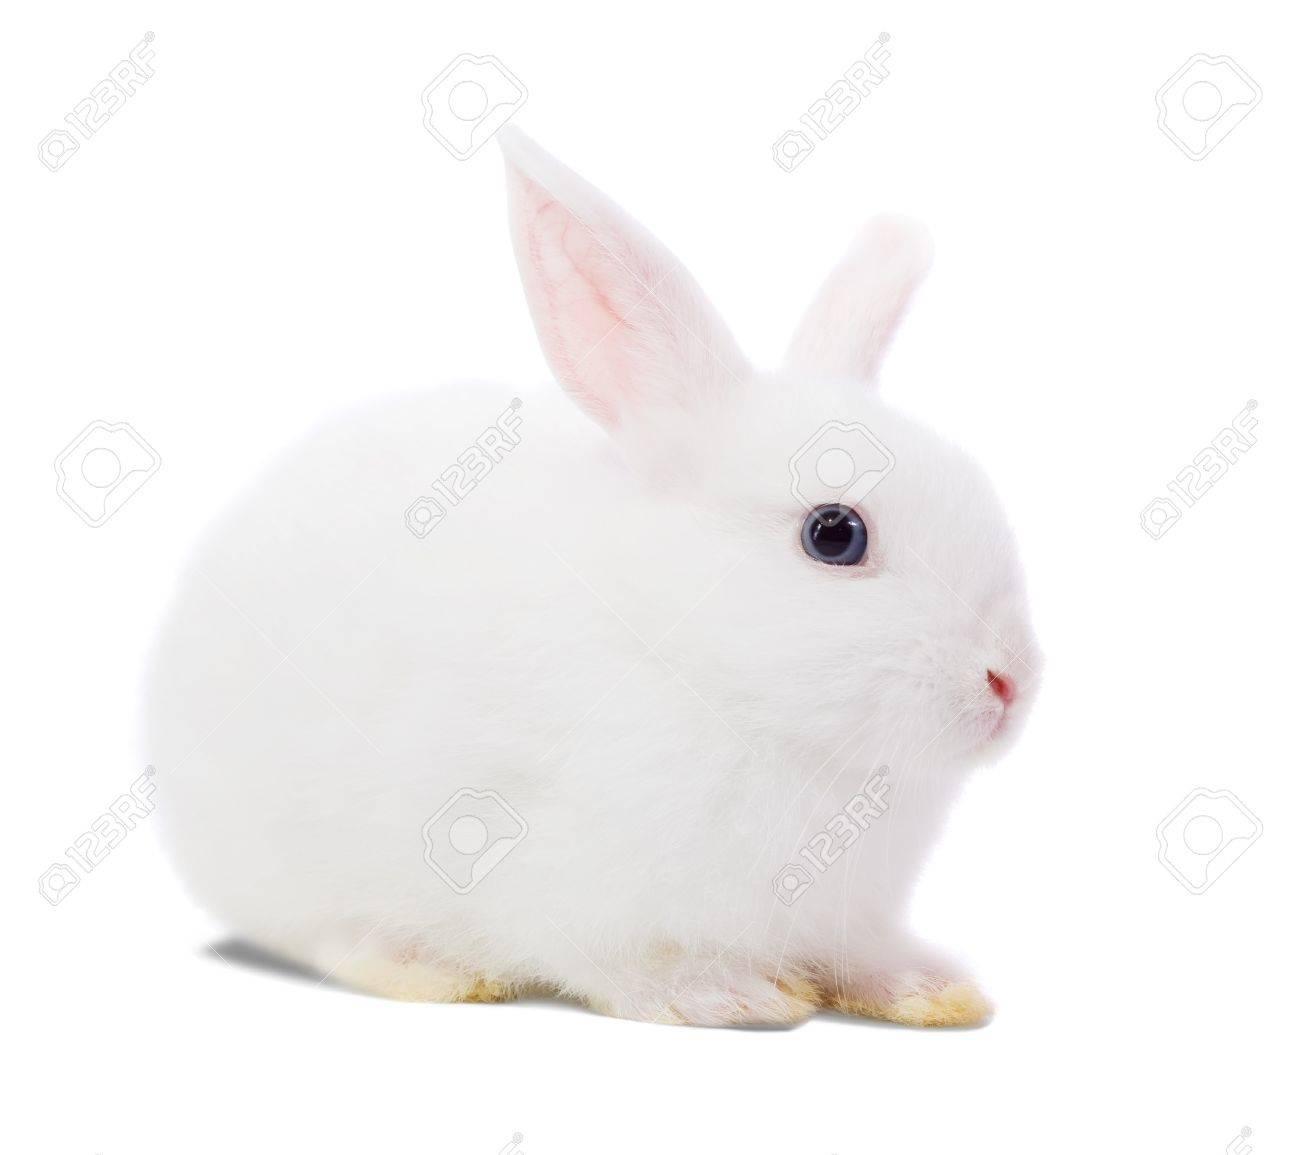 Little white rabbit. Isolated on white background Stock Photo - 8000567